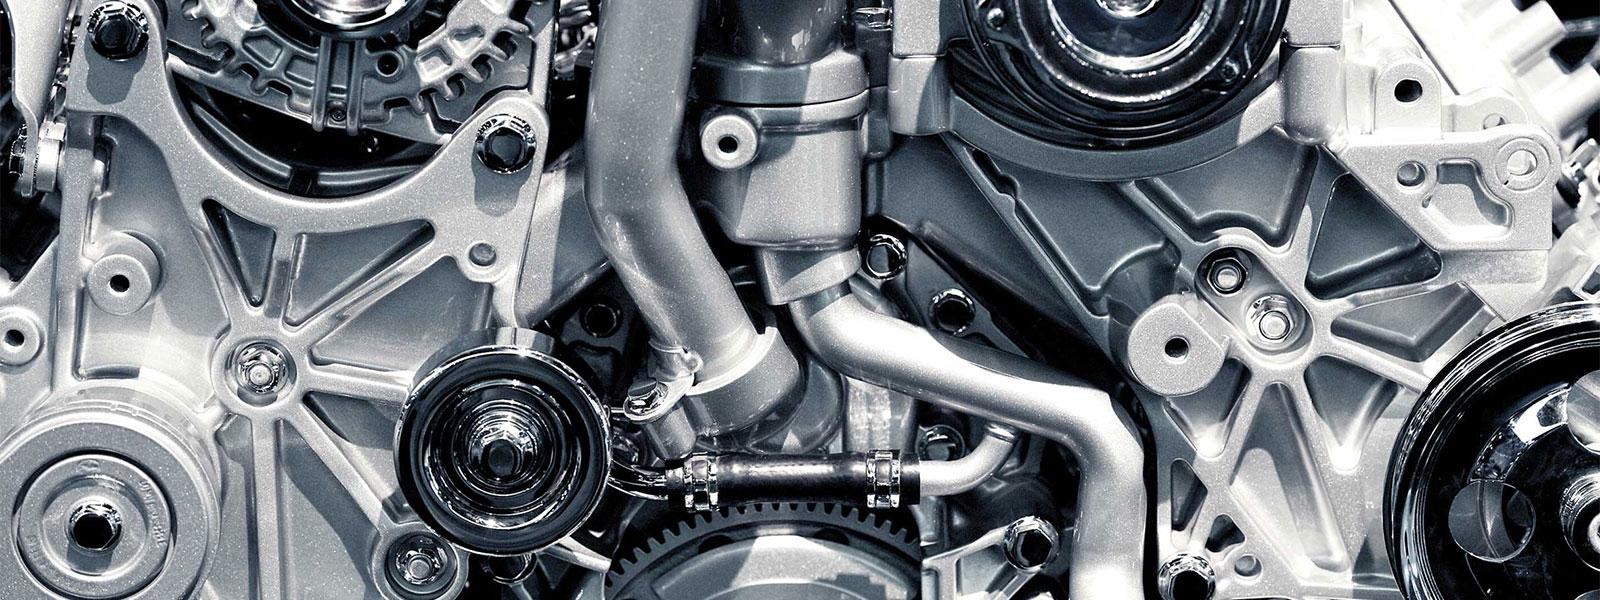 Engine-Detailing-01